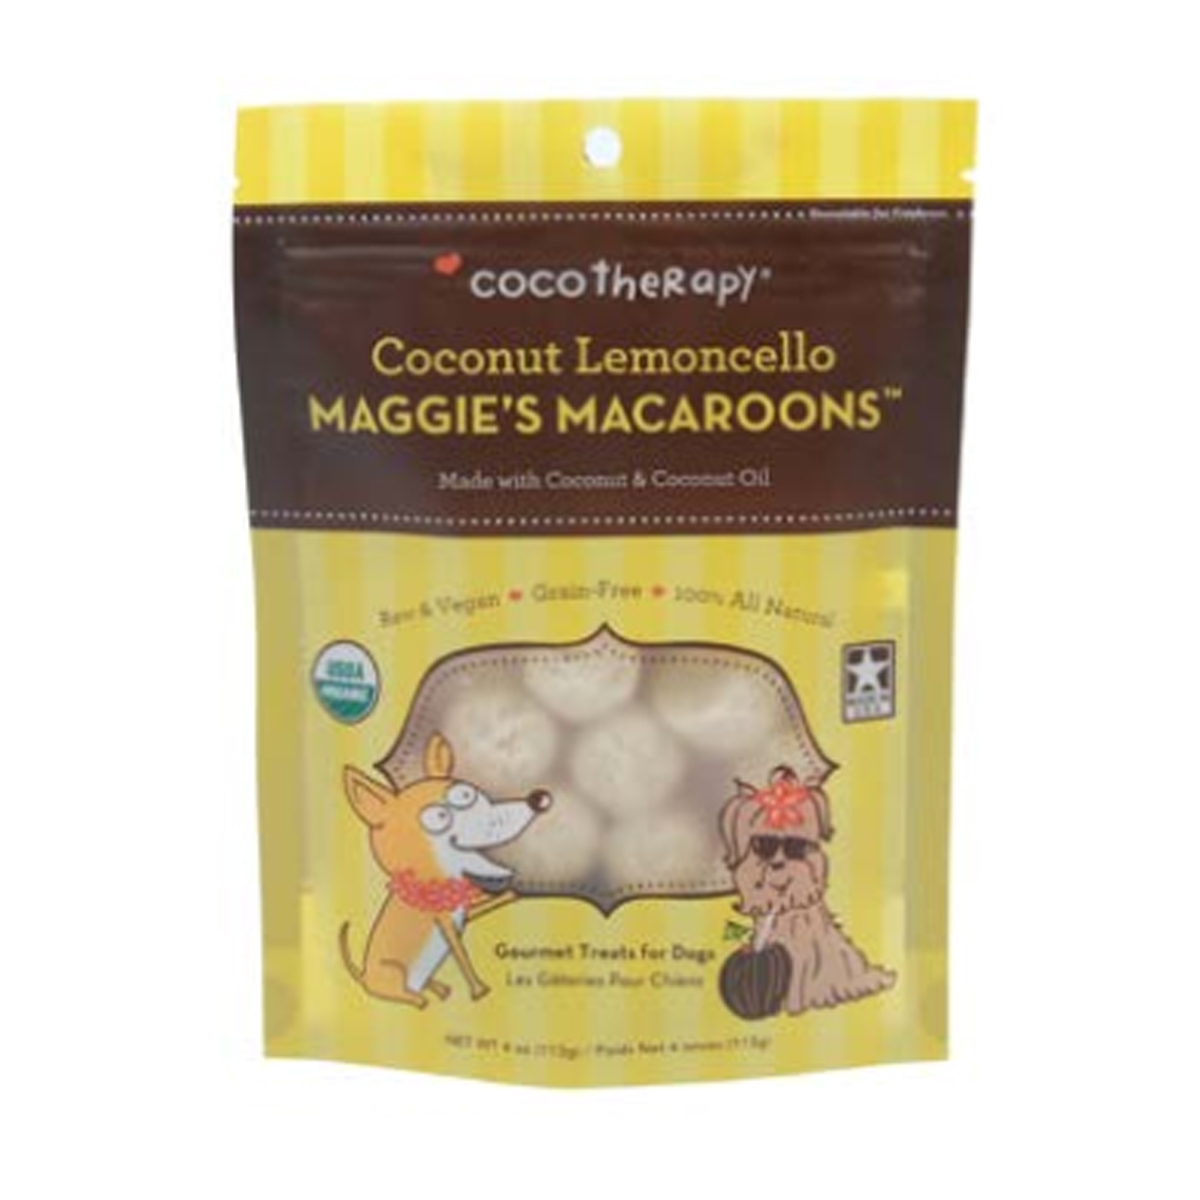 CocoTherapy Maggie's Macaroons Pet Treat - Coconut Lemoncello